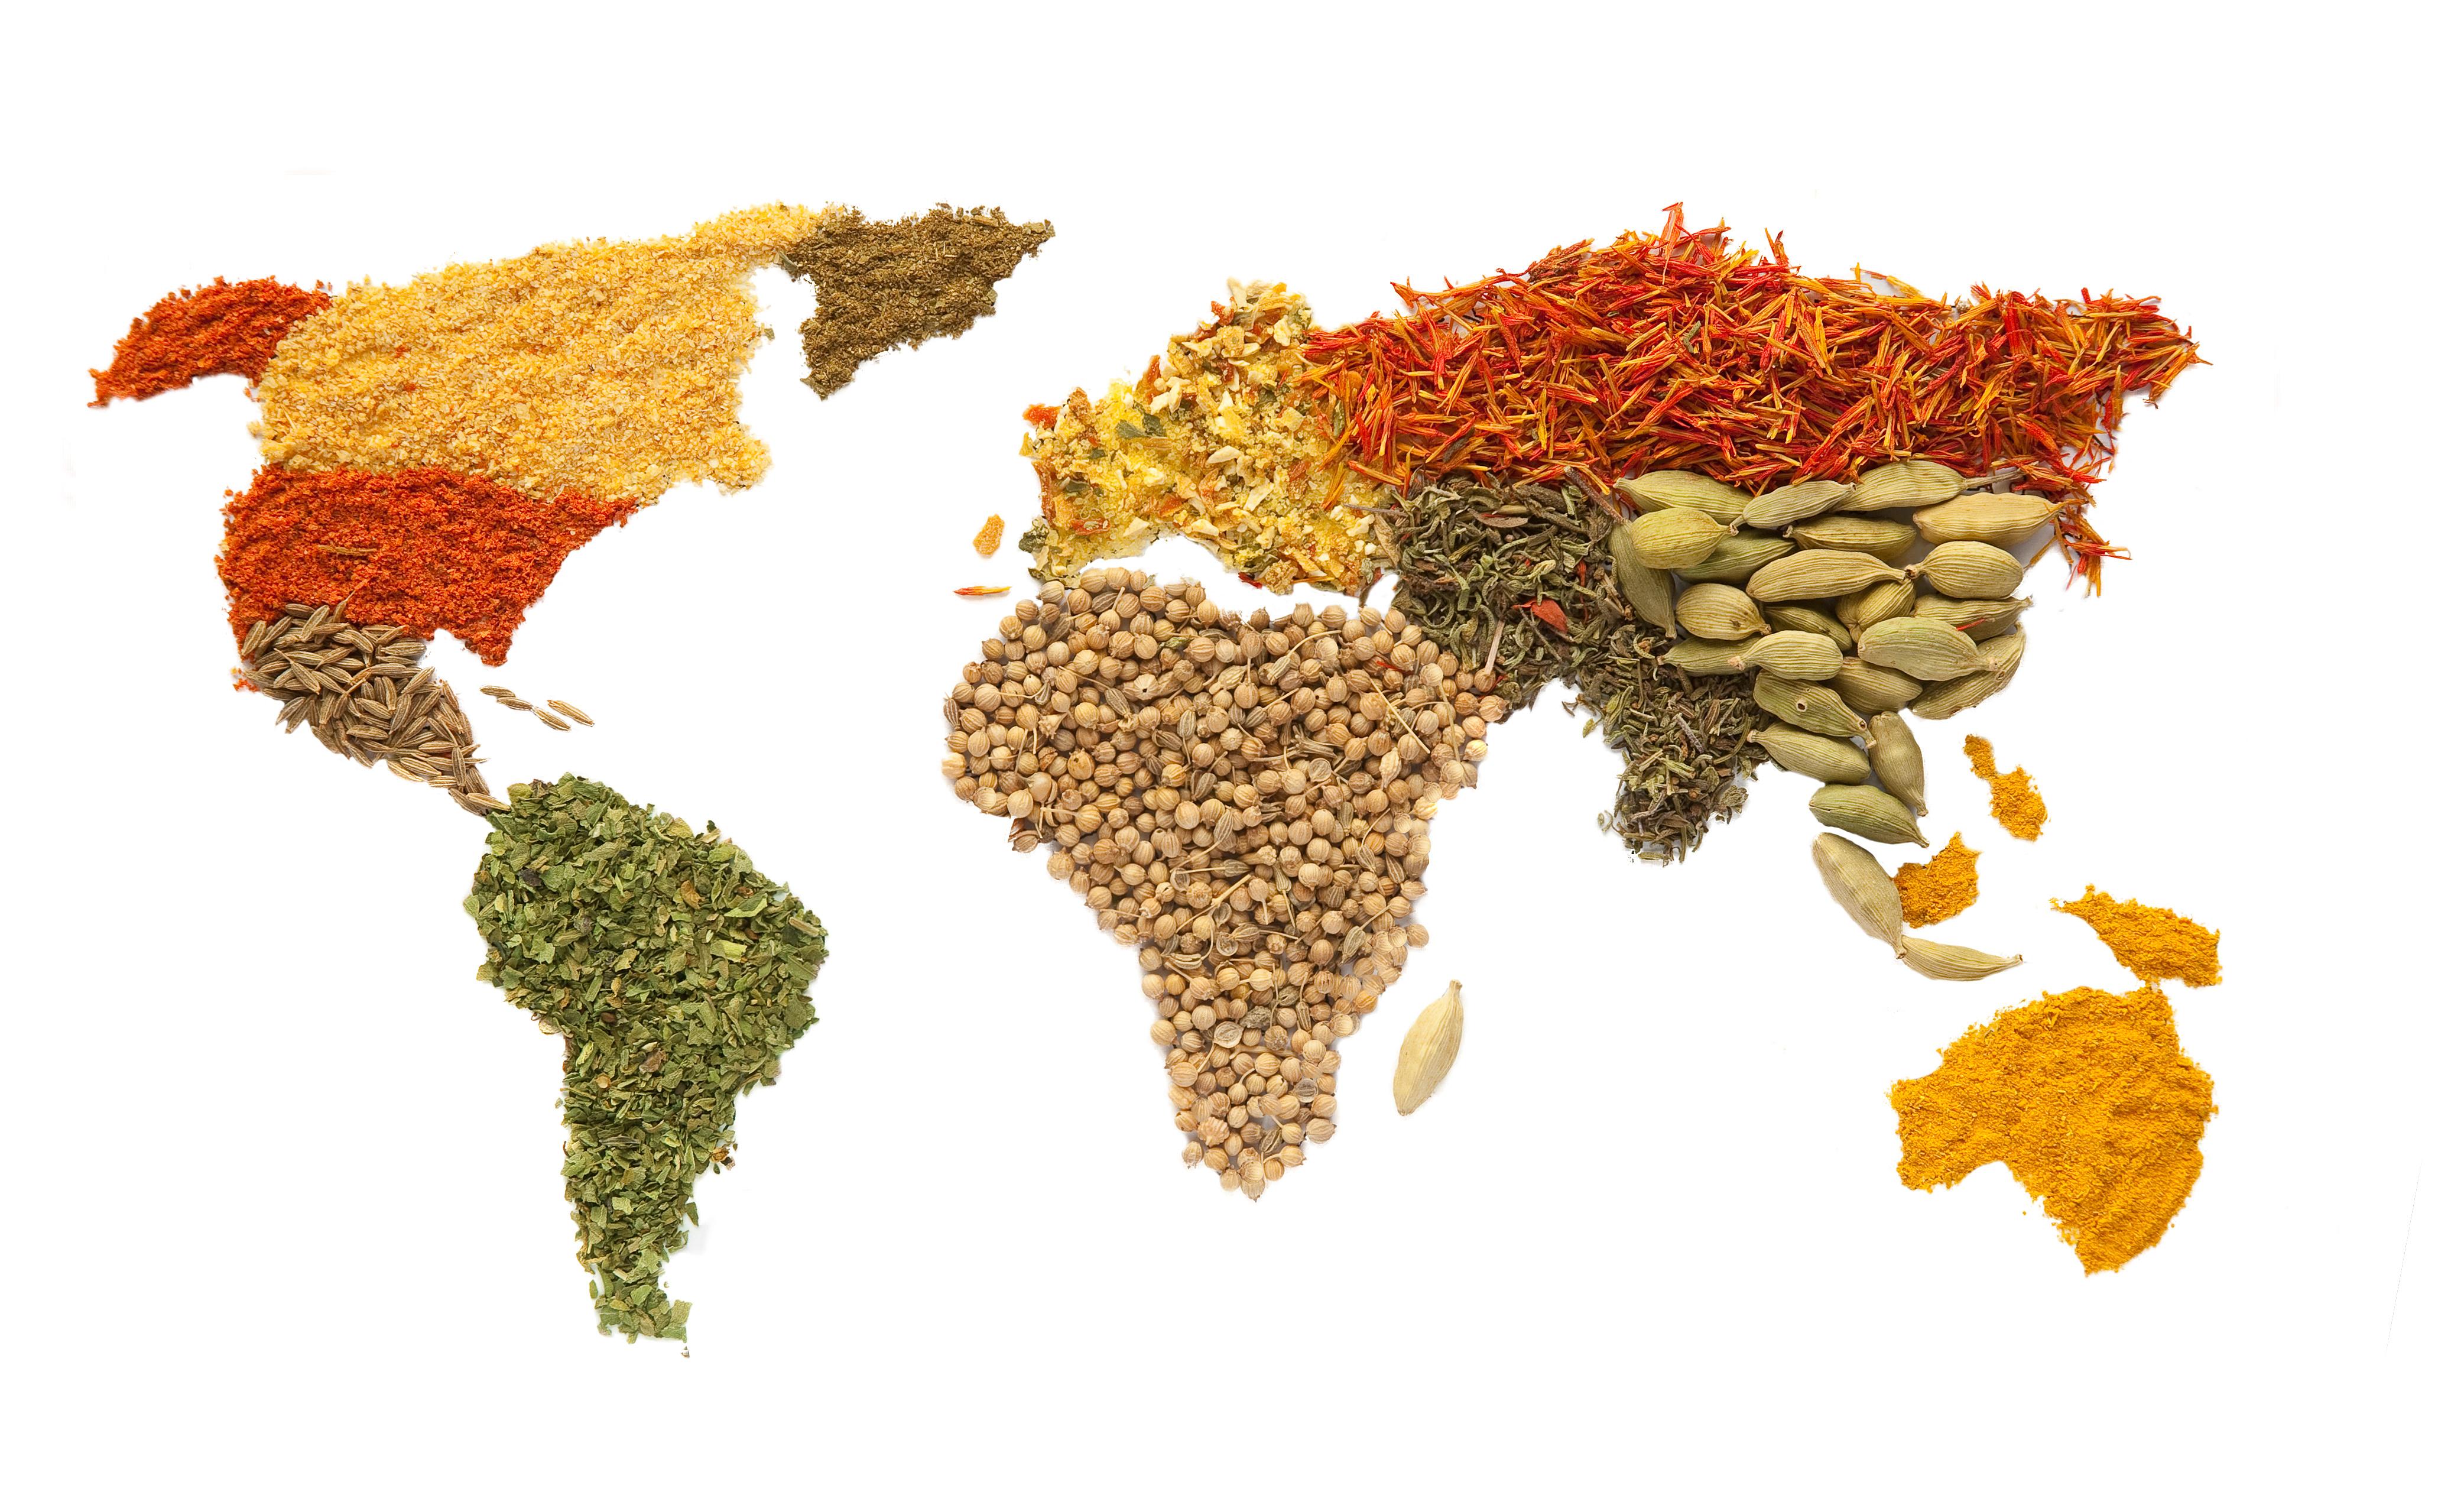 Embracing the Value of FoodLogiQ's Global Supplier Network